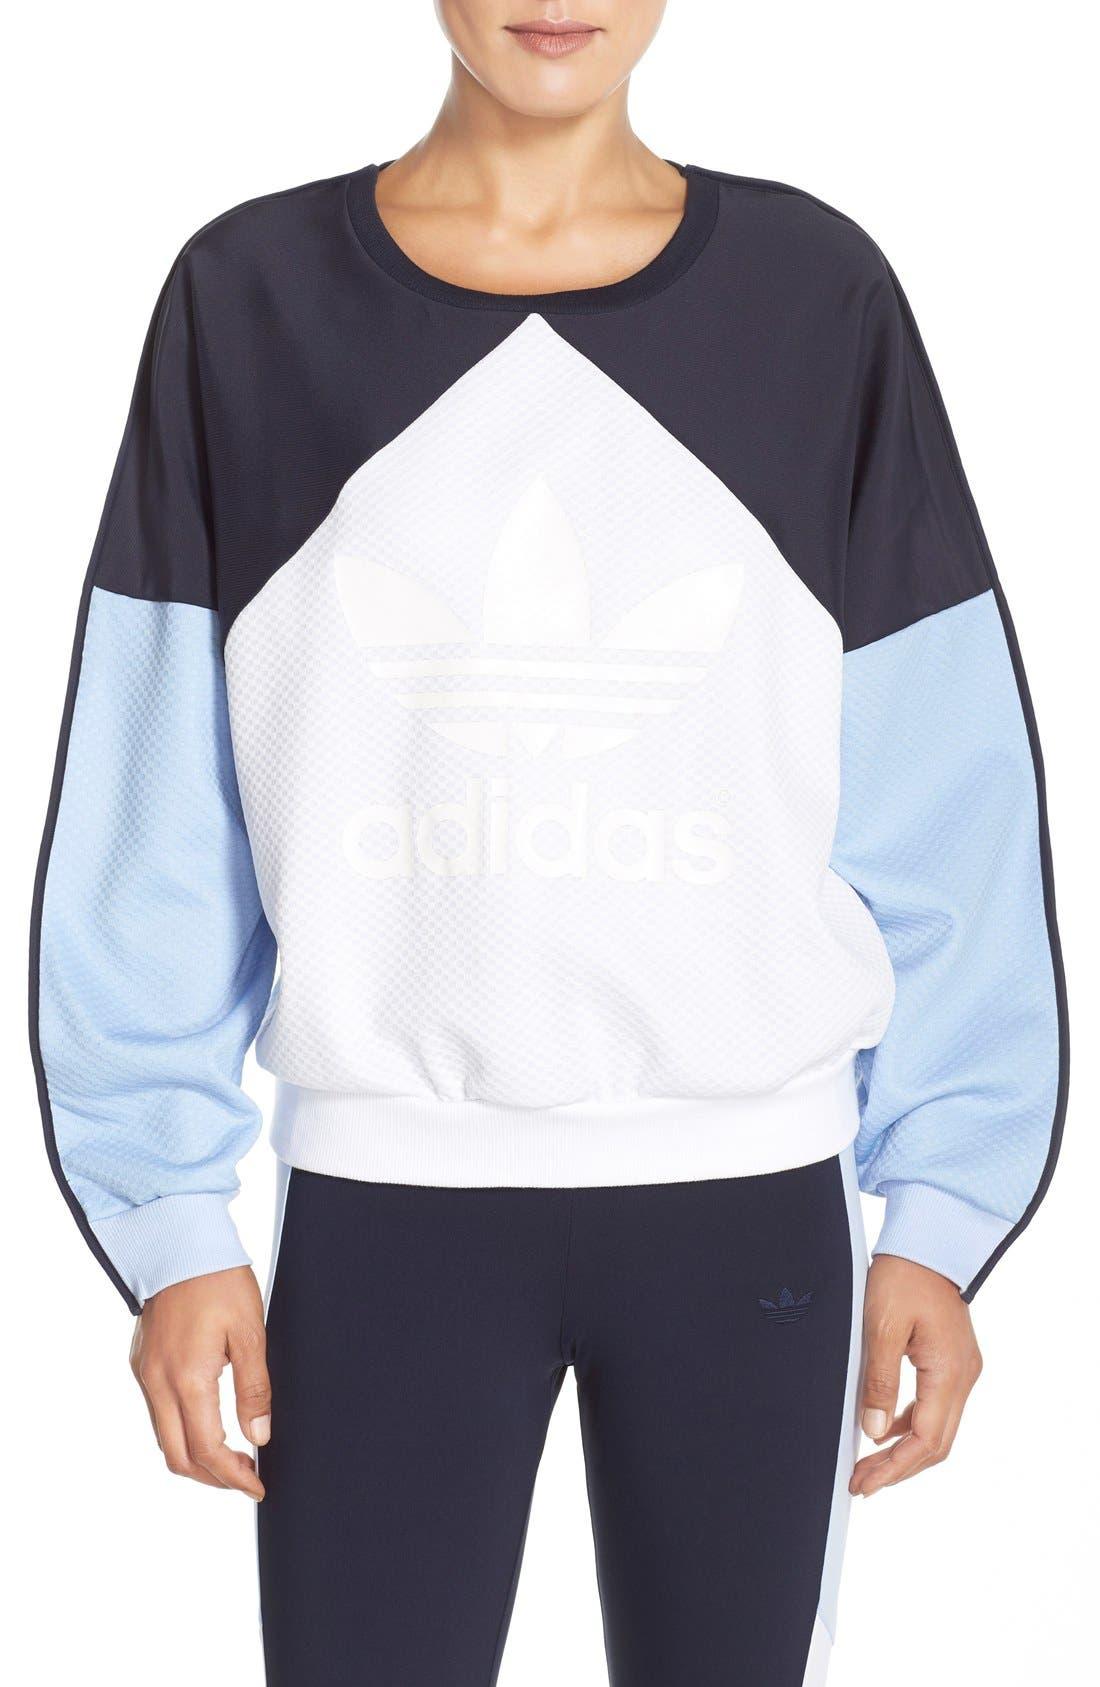 Alternate Image 1 Selected - adidas Originals 'Helsinki' Crewneck Sweatshirt